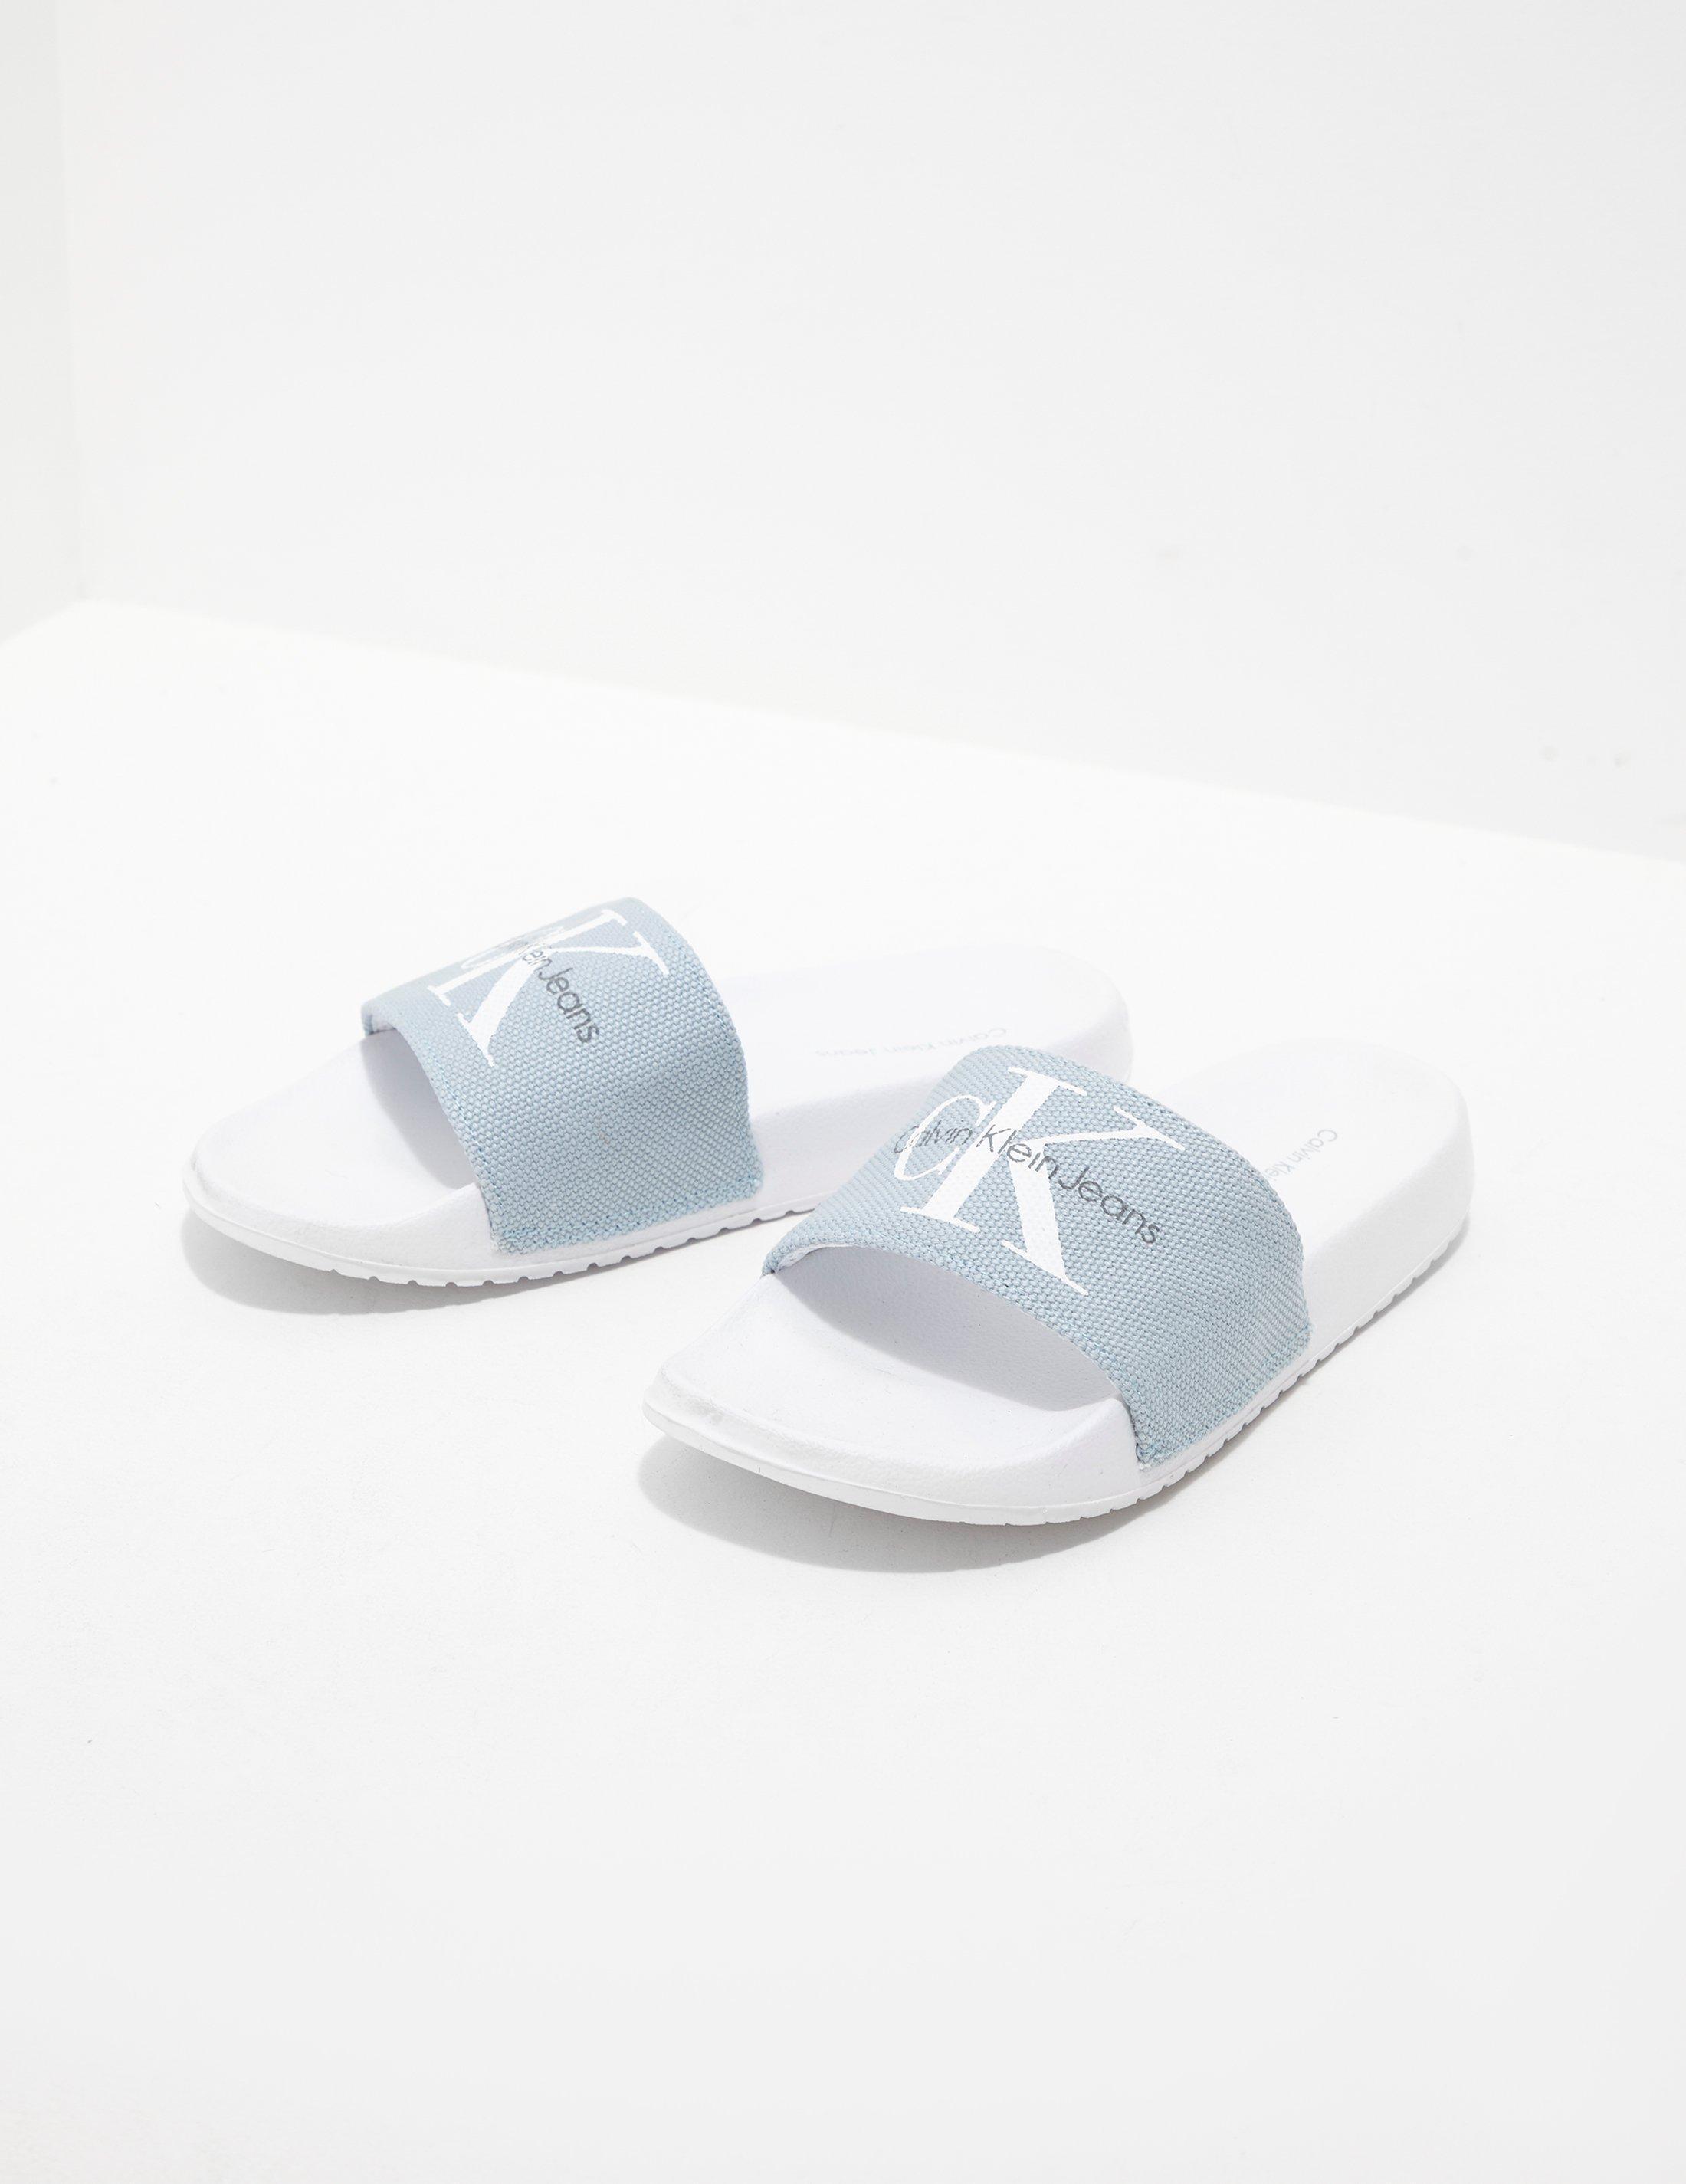 b6b464762 Calvin Klein Chantal Slides Women s White in White - Lyst